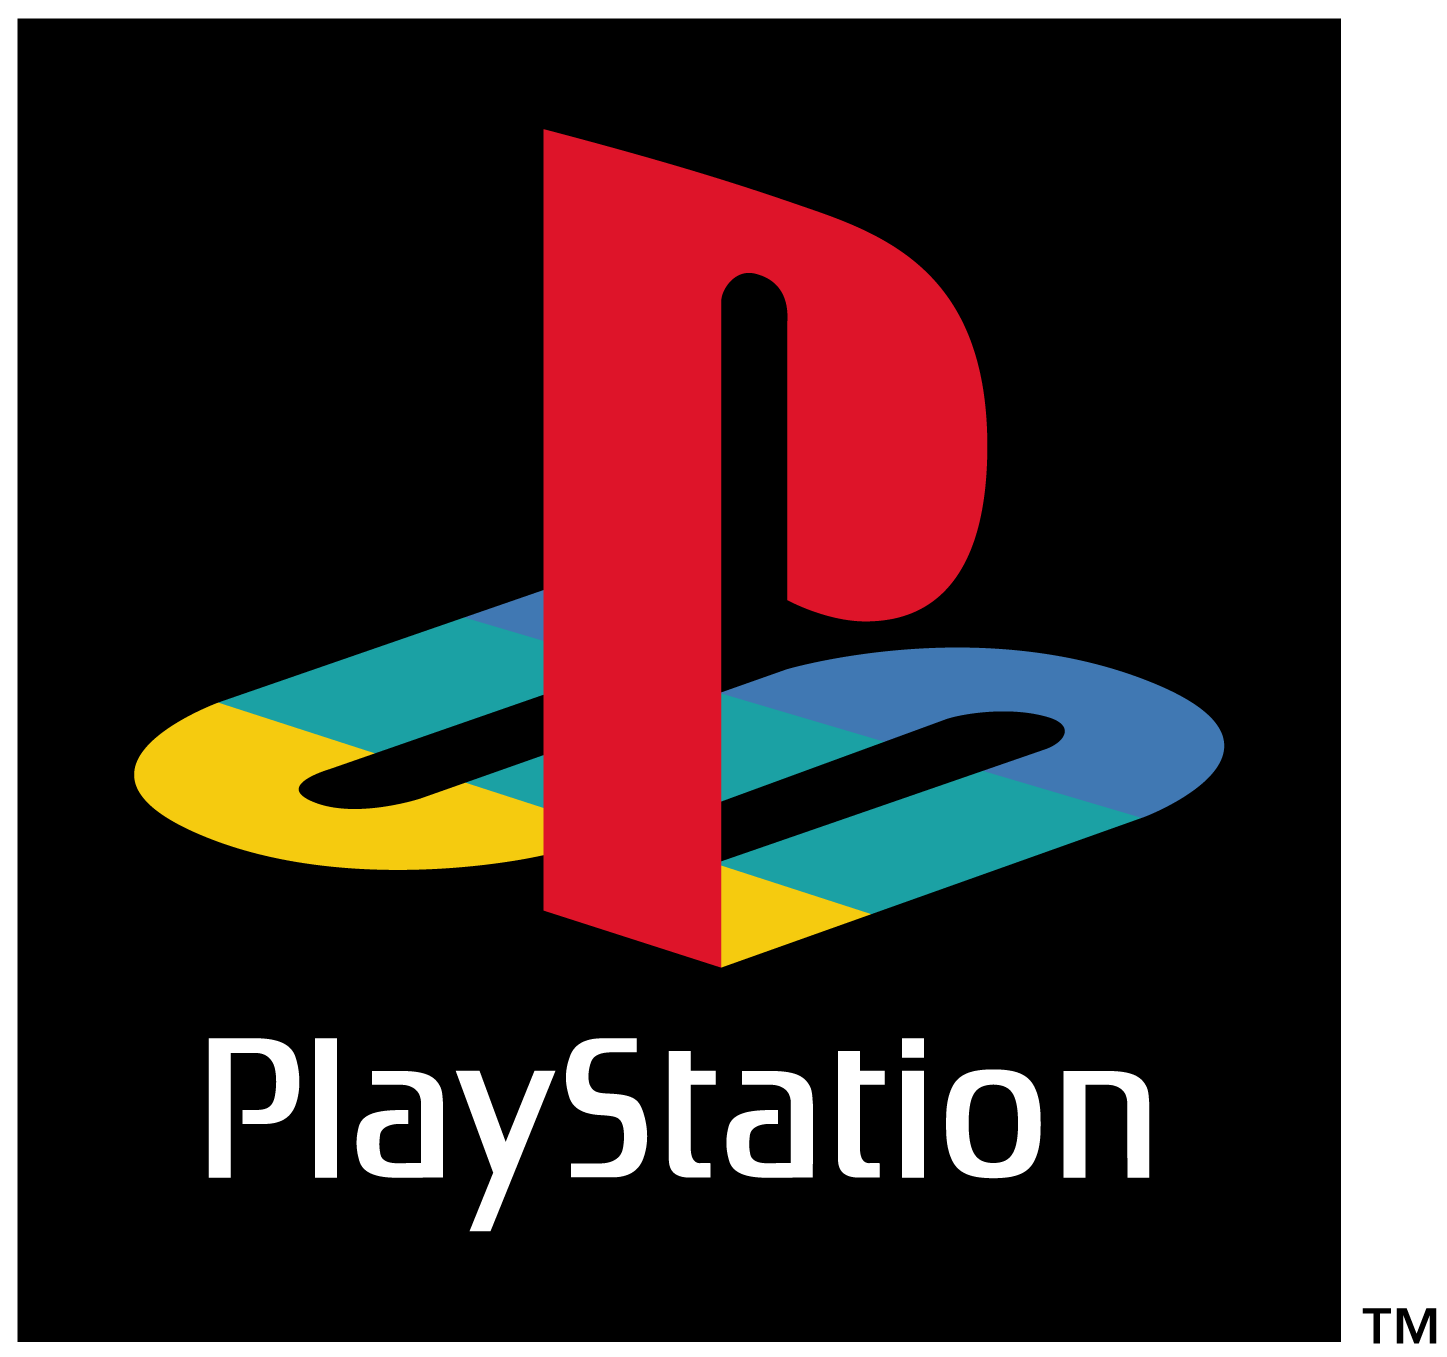 image logo psx png logopedia fandom powered by wikia rh logos wikia com playstation 1 logo sticker playstation 1 logo youtube